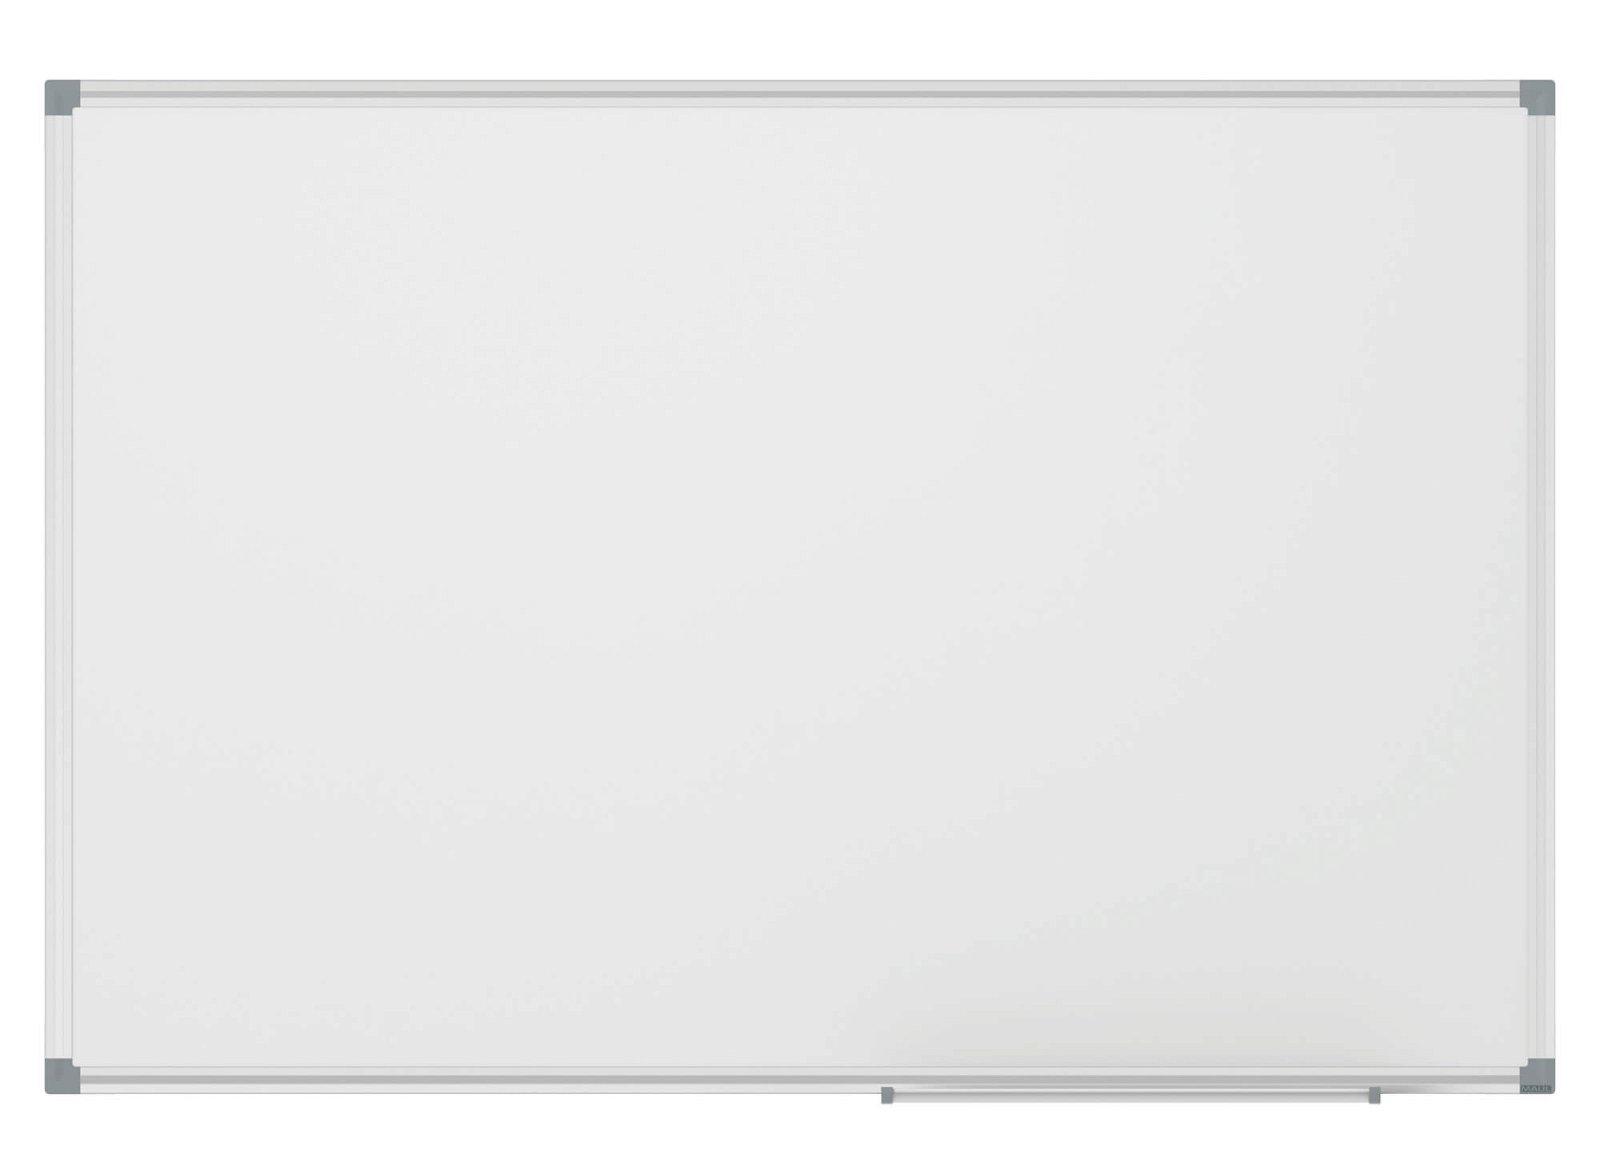 Whiteboard MAULstandard, 100x150 cm, grau